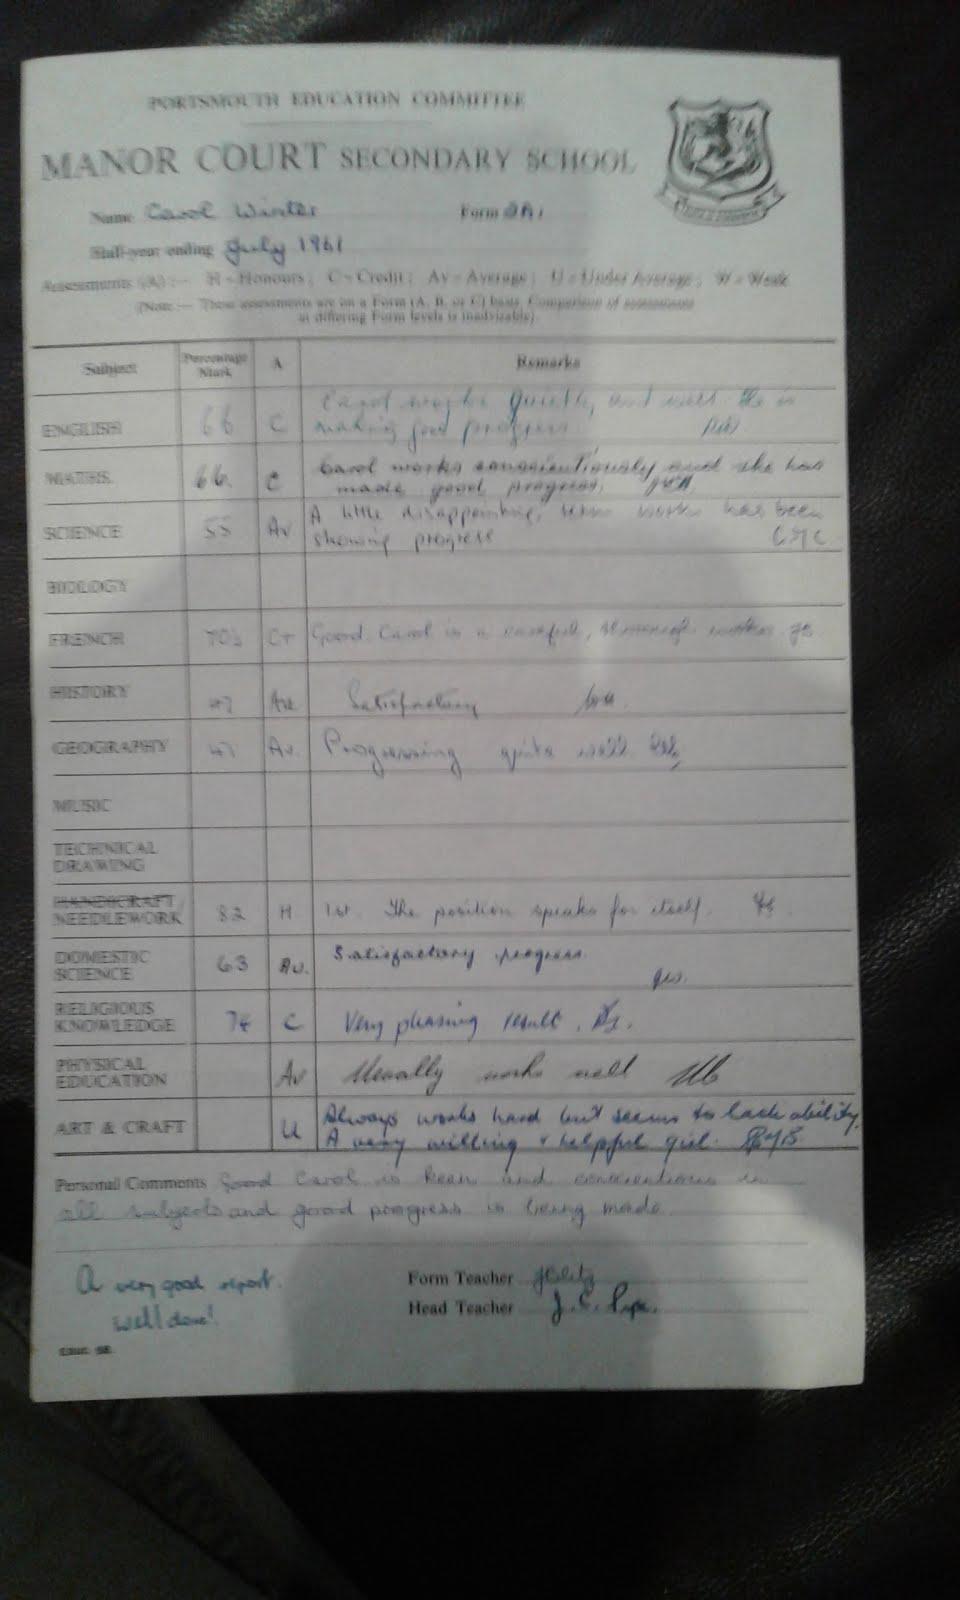 Carol Winters school report